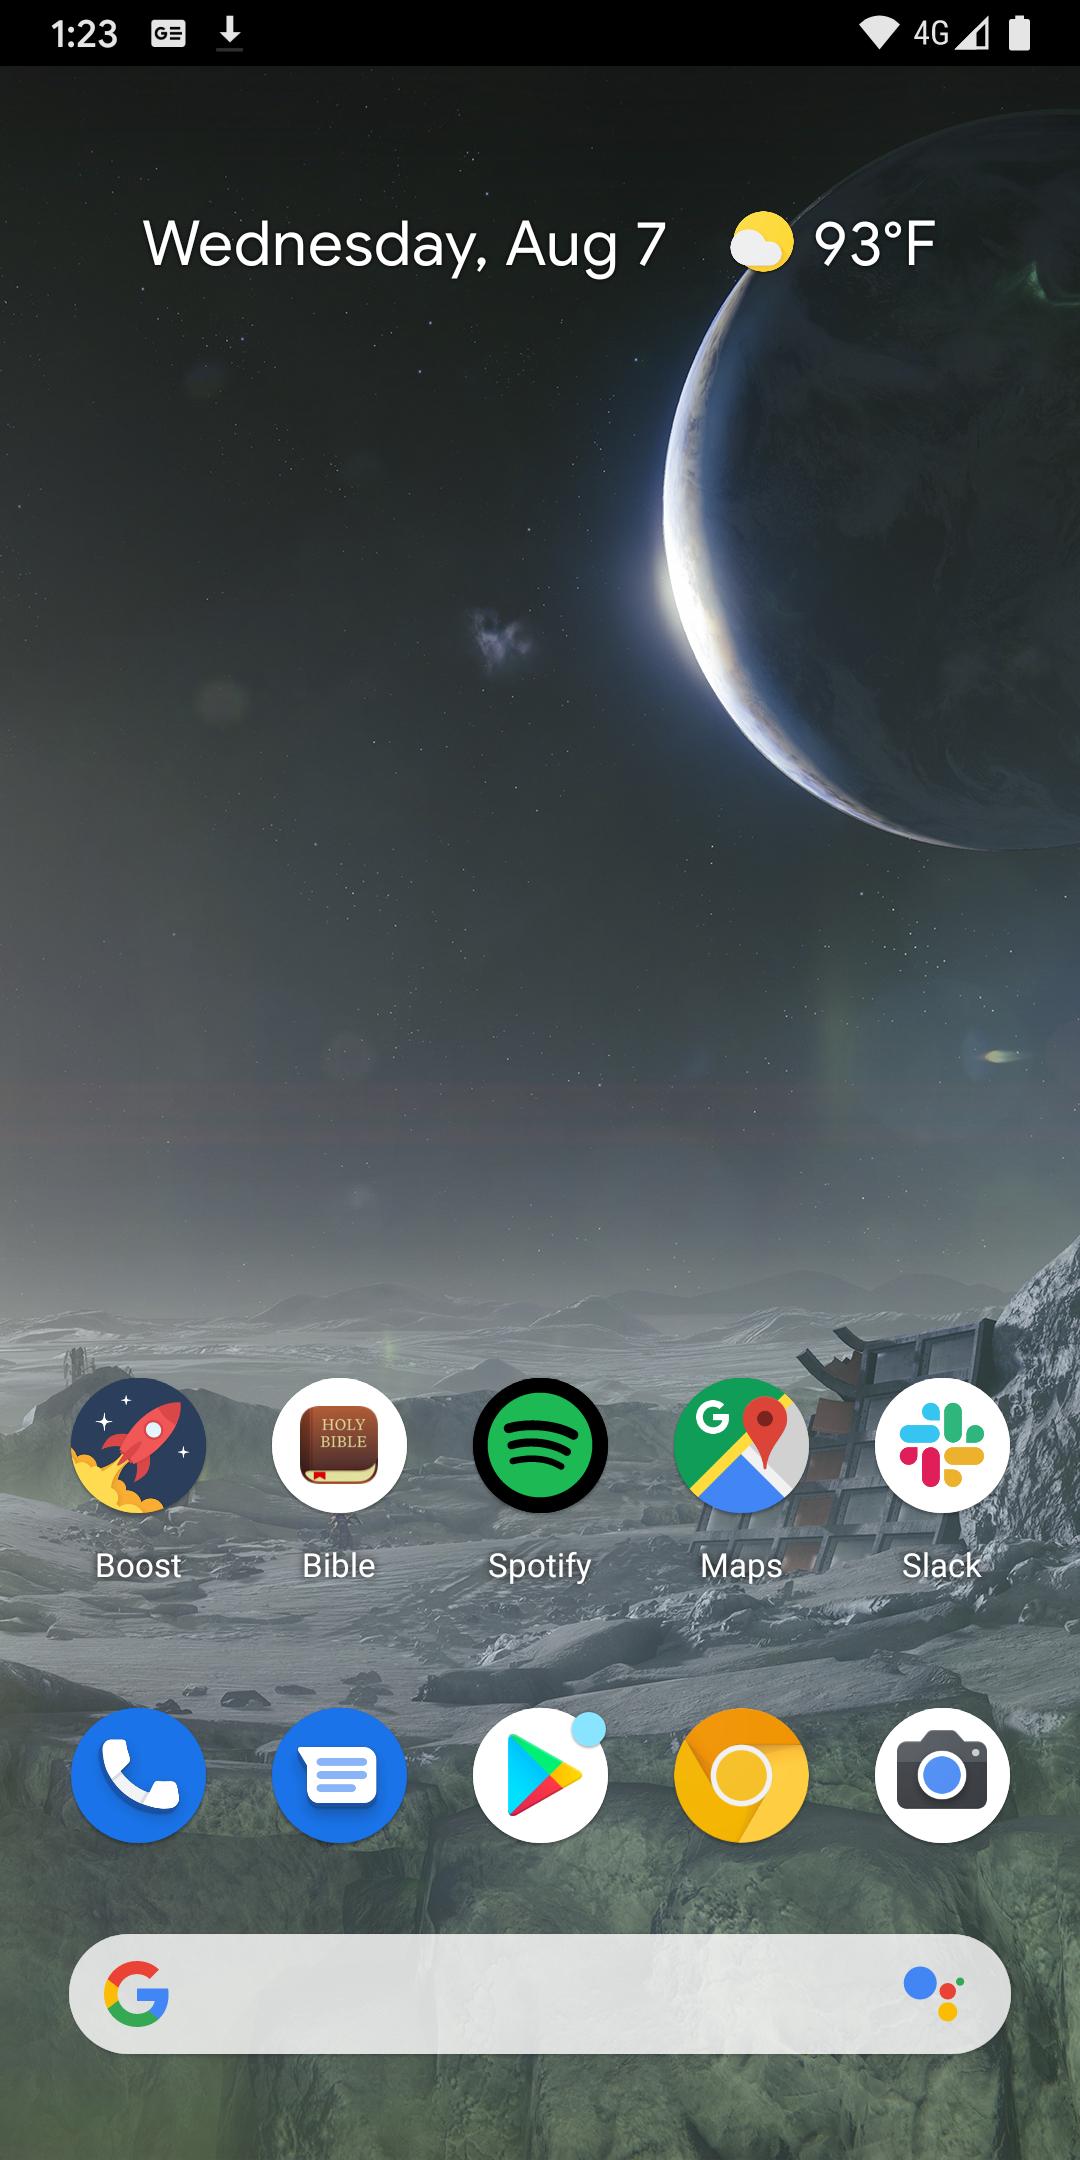 Android Q Beta 6: Gesture nav bar hidden on home screen